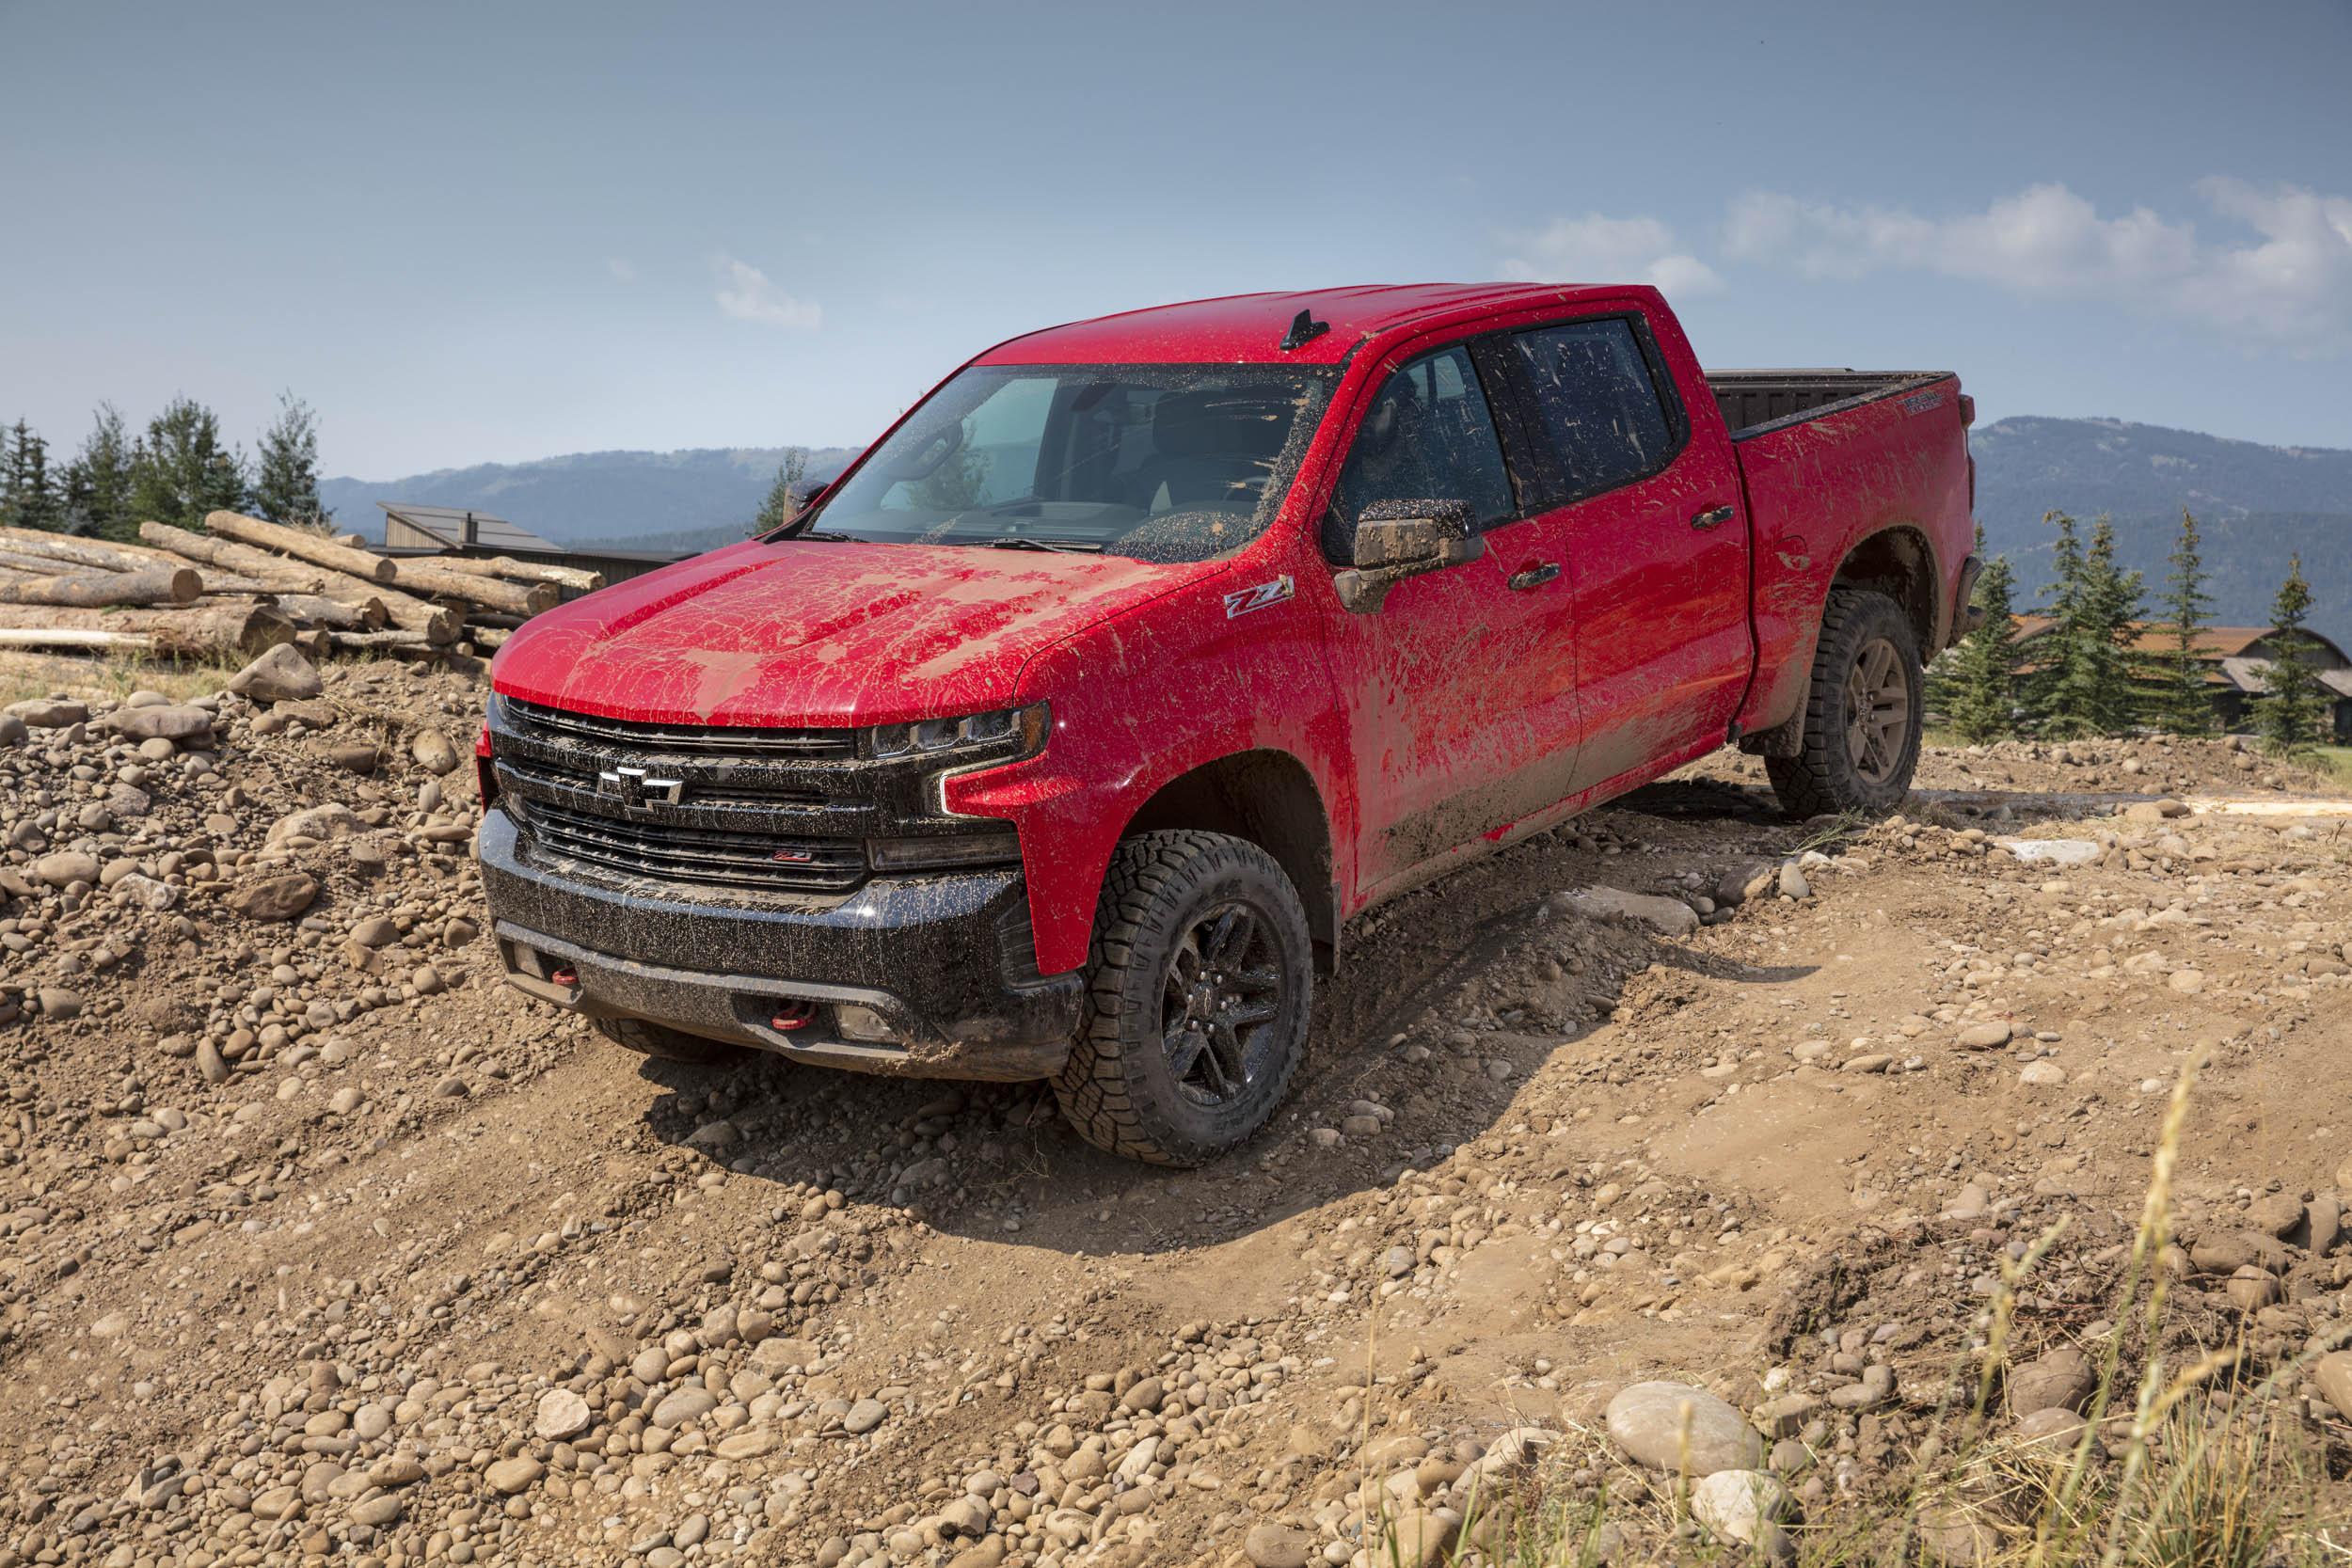 2019 chevrolet silverado Trail Boss on dirt road